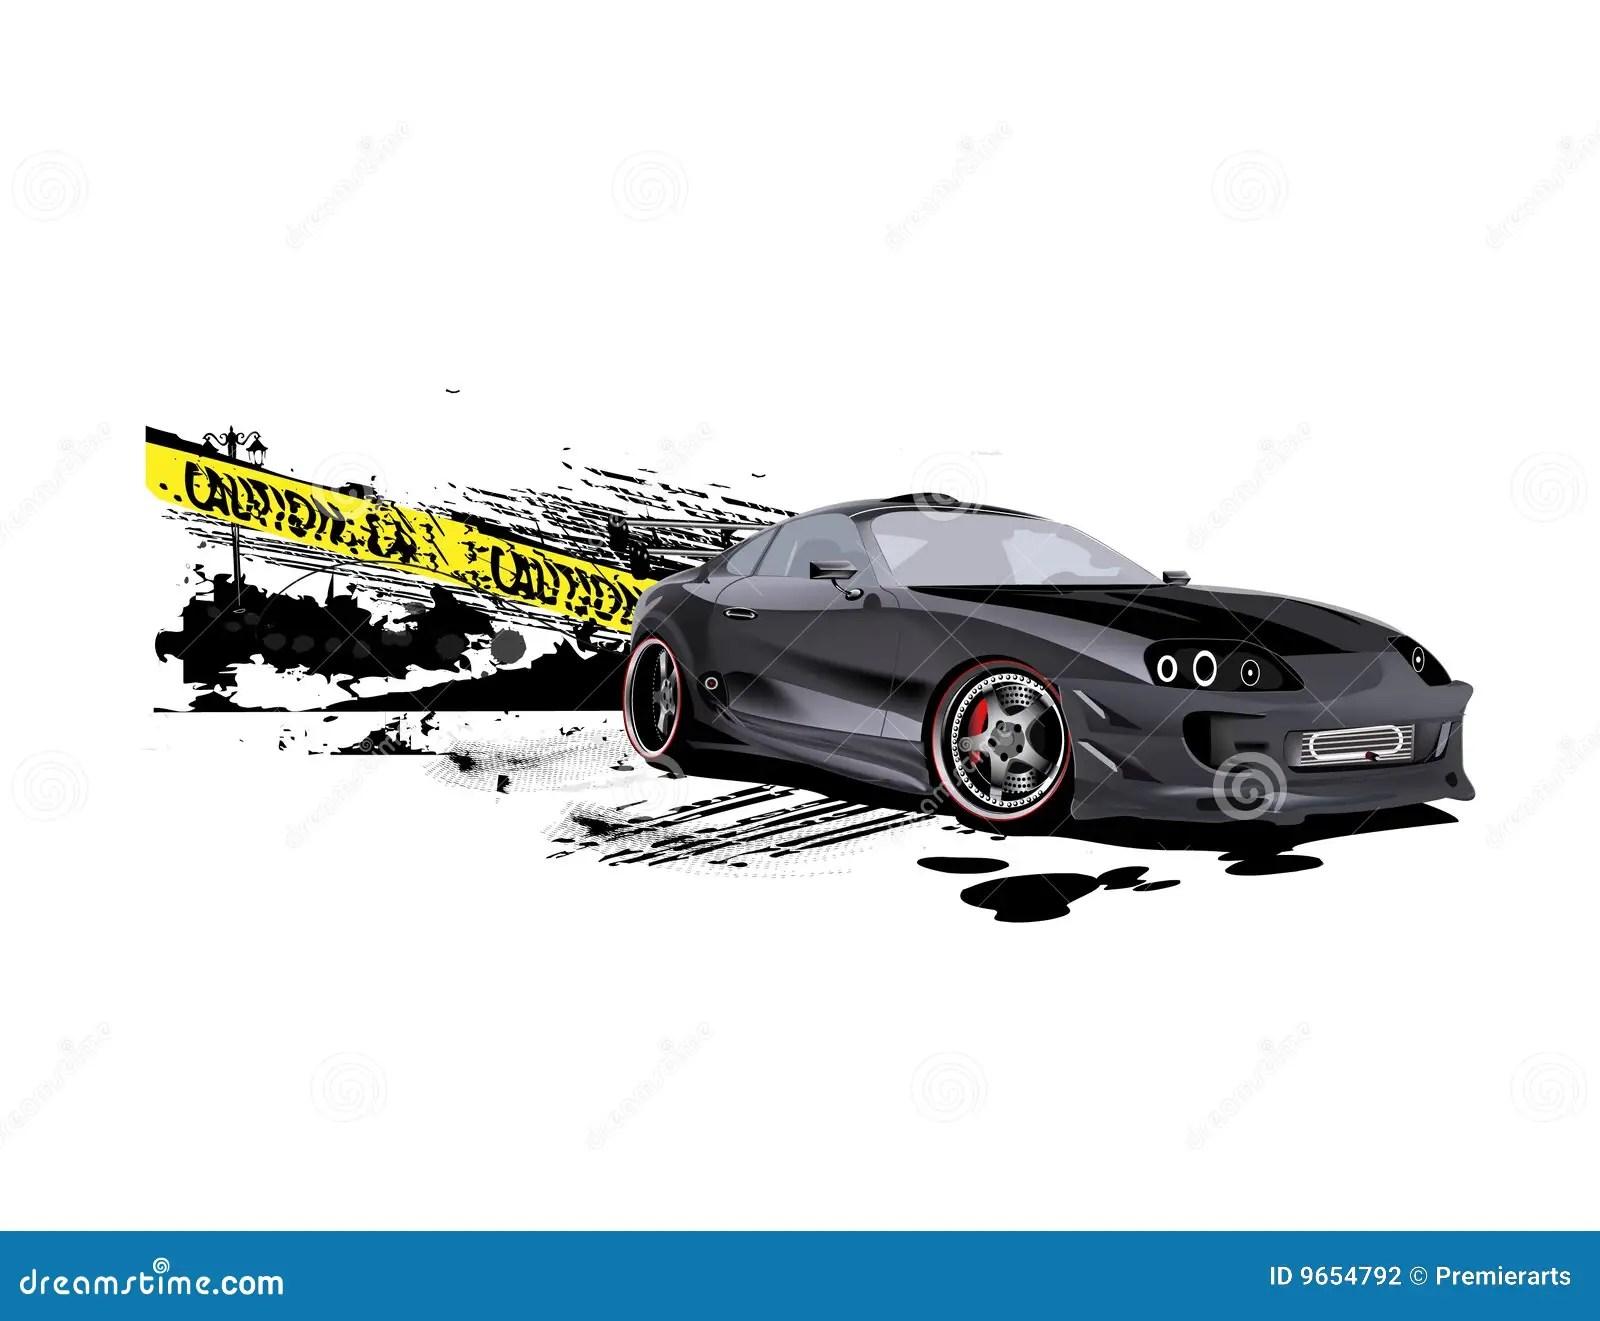 Drifter Cartoons Illustrations Amp Vector Stock Images